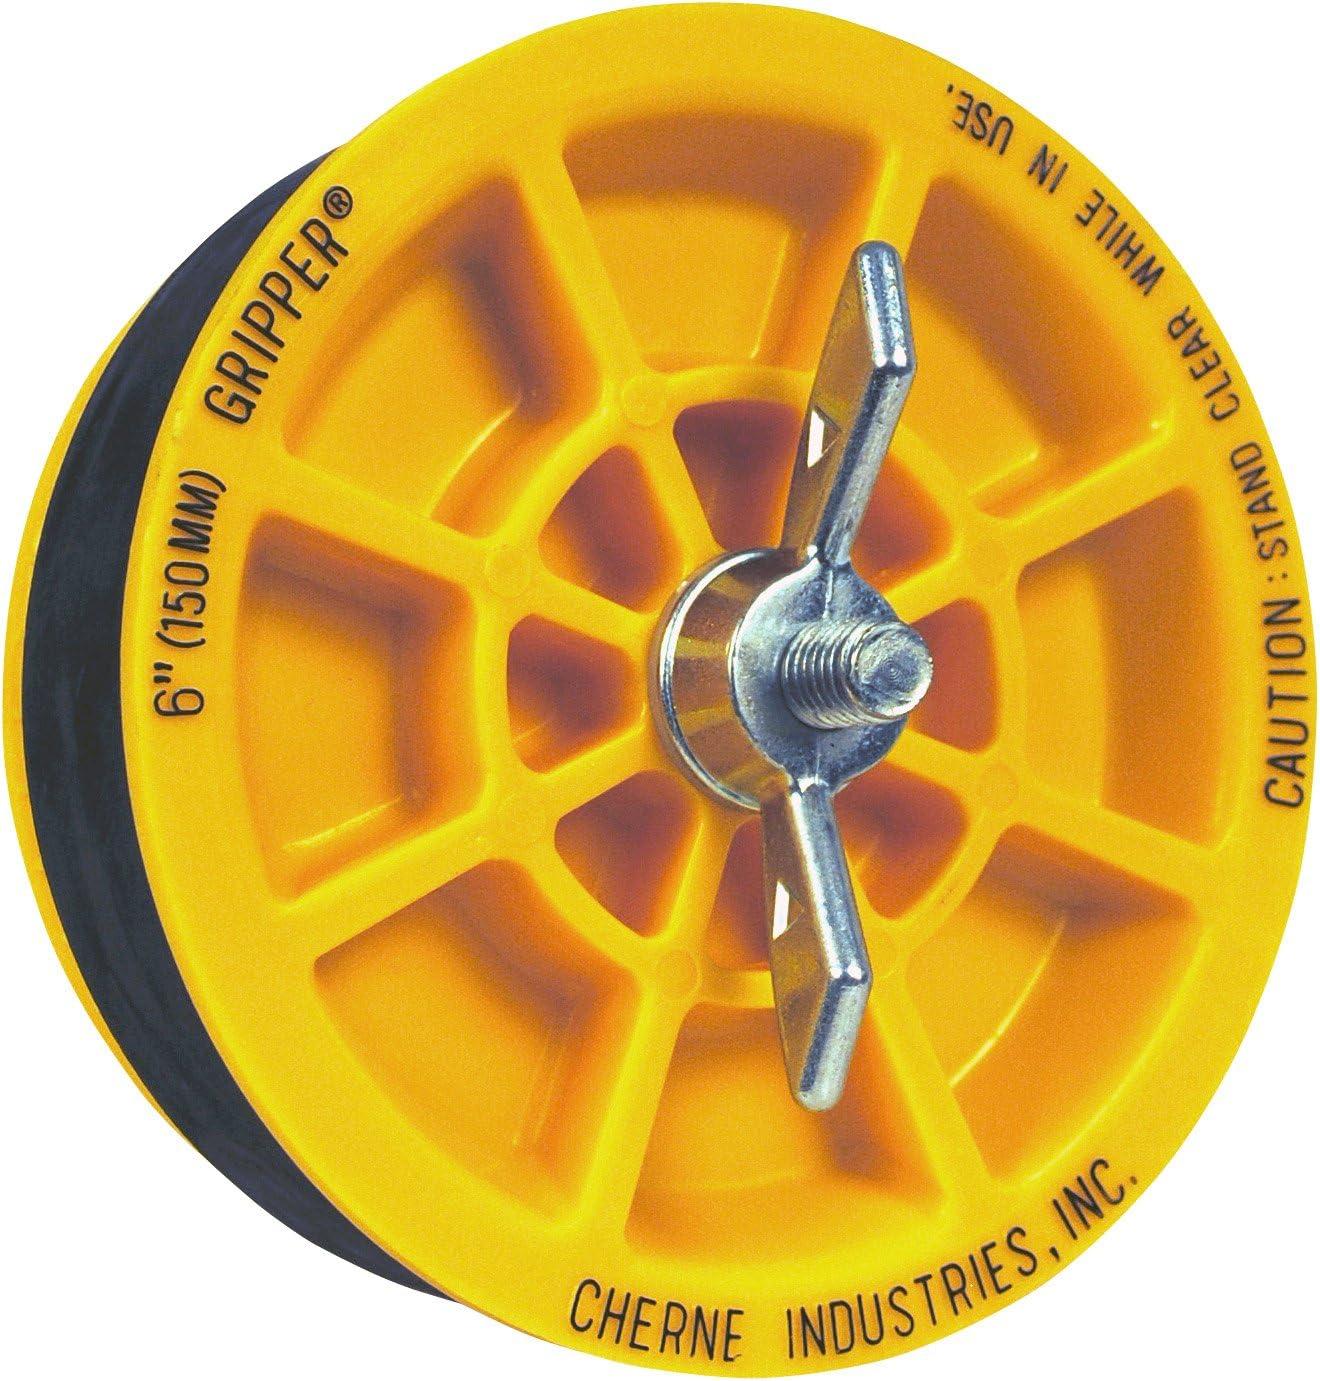 Oatey 270261 Cherne Gripper 6-inch End of Pipe Plug